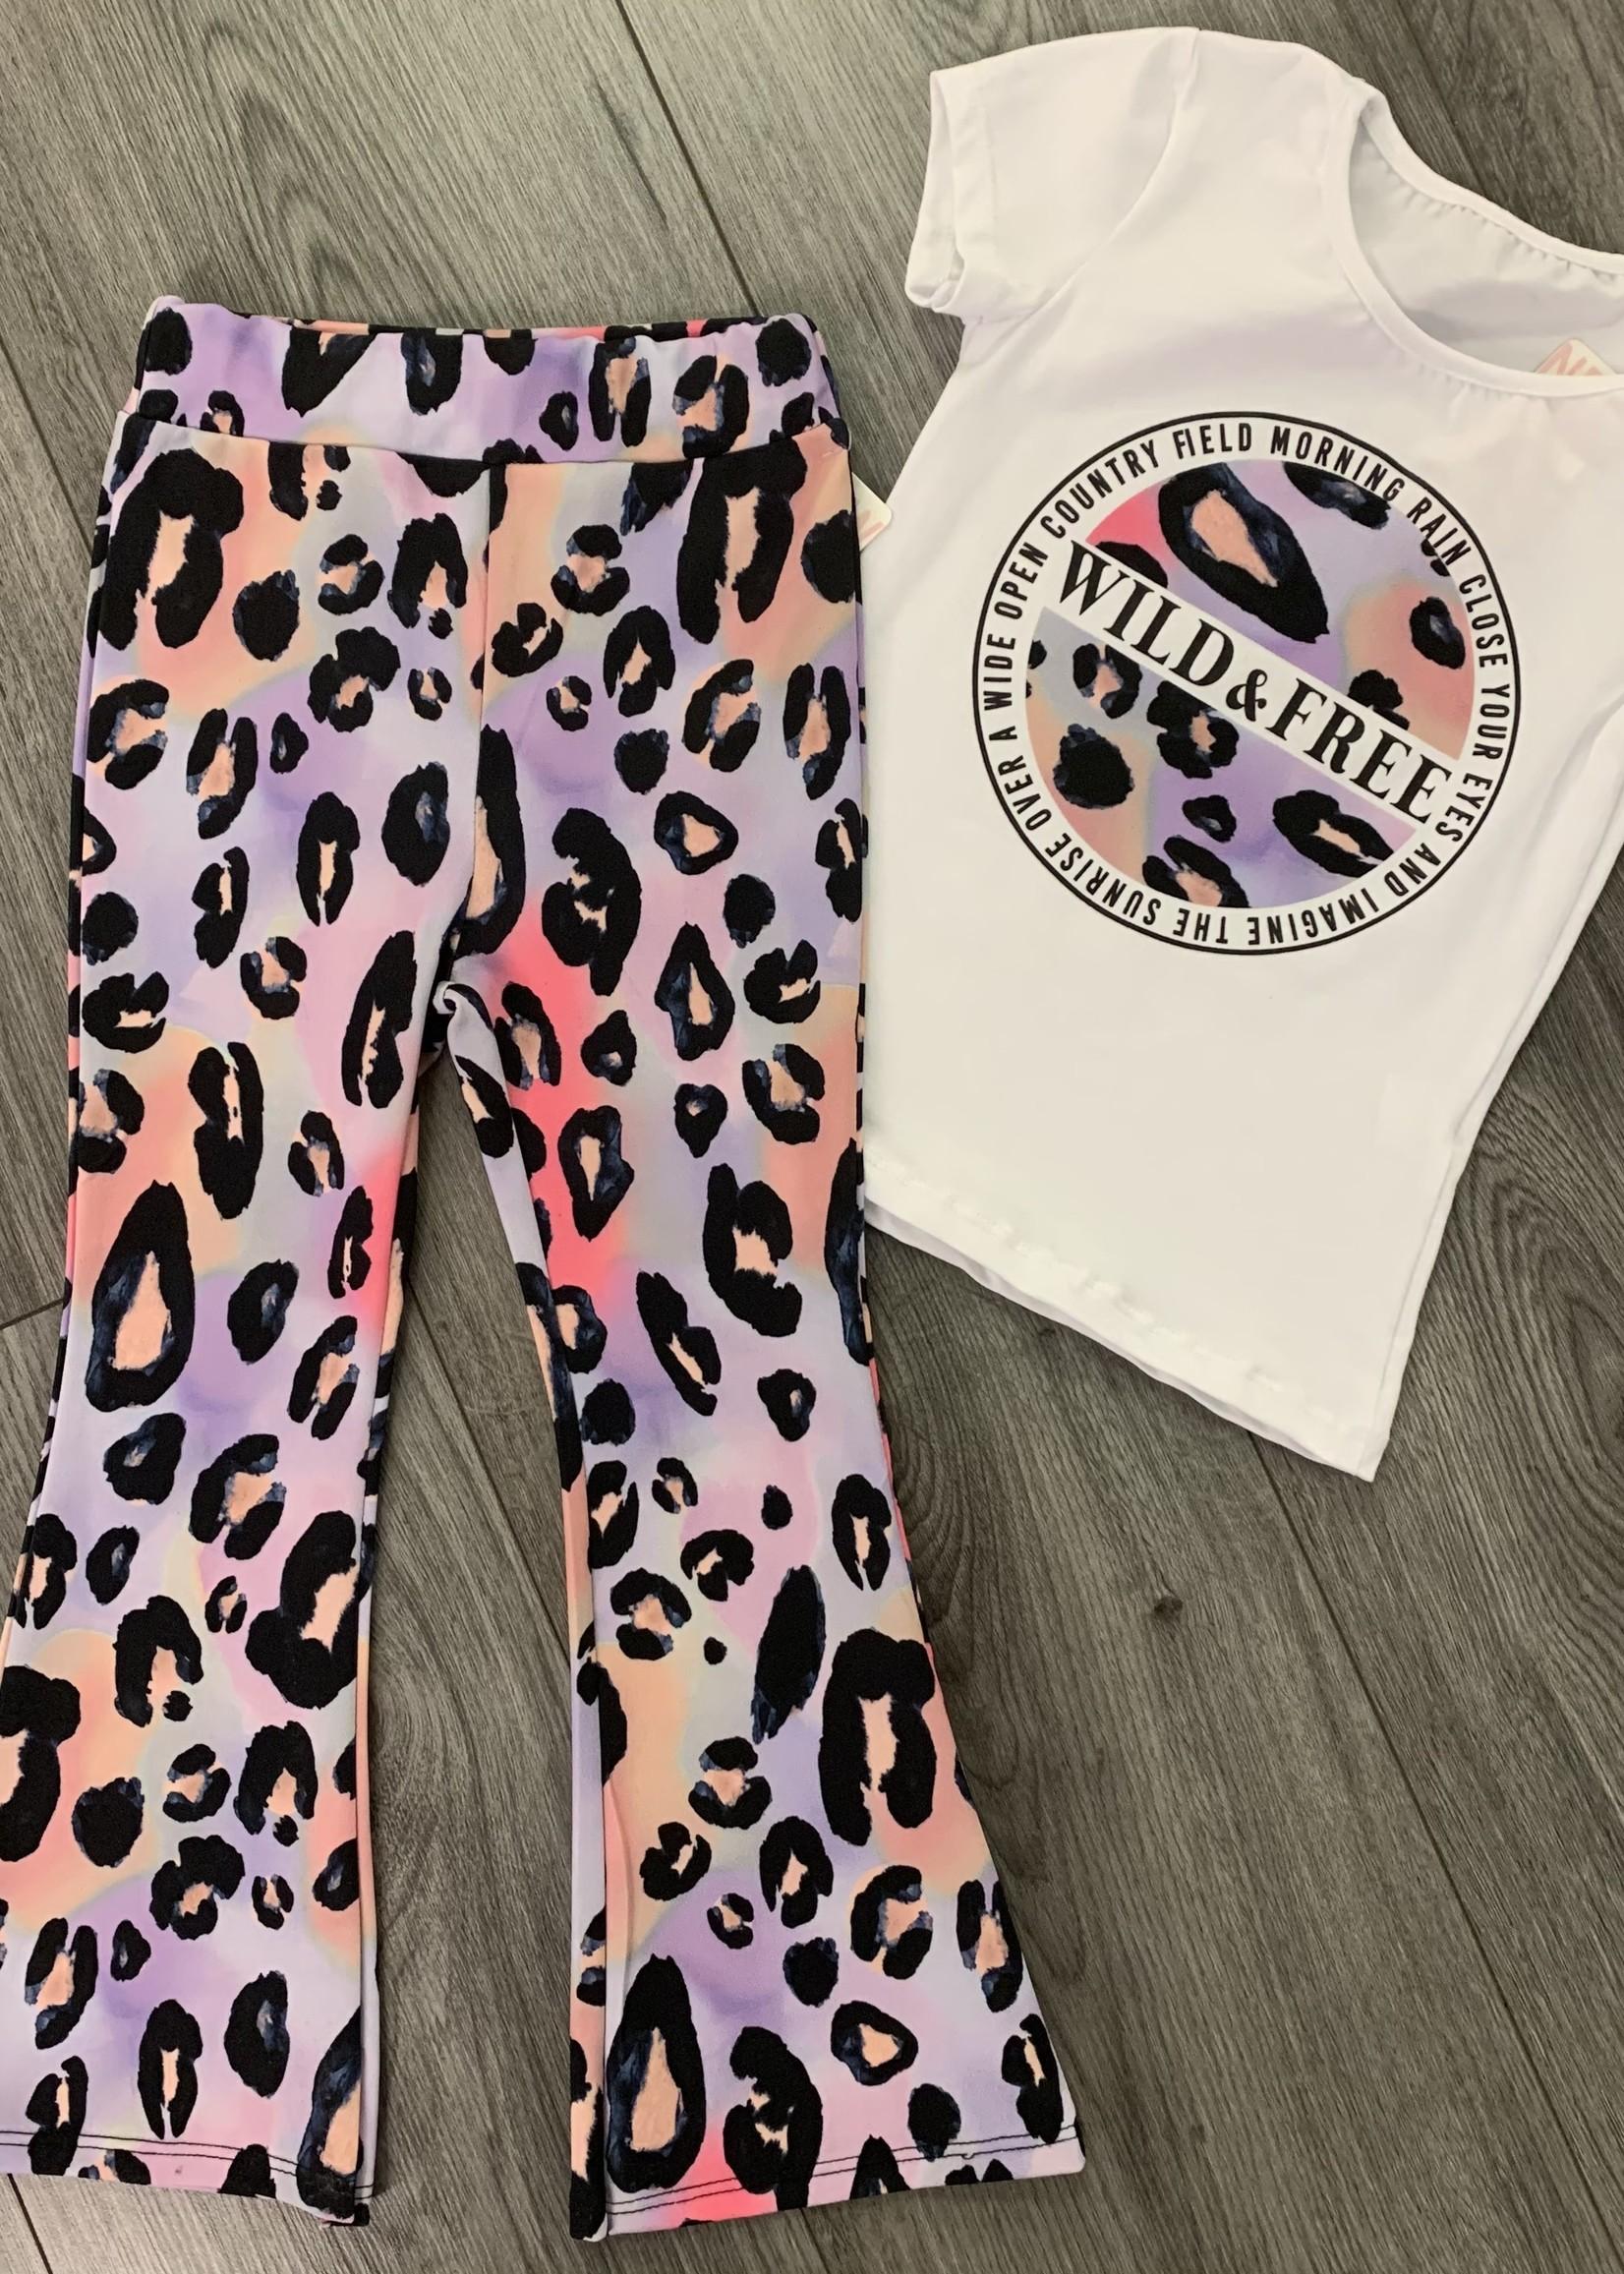 Divanis Divanis wild & free flared pants set